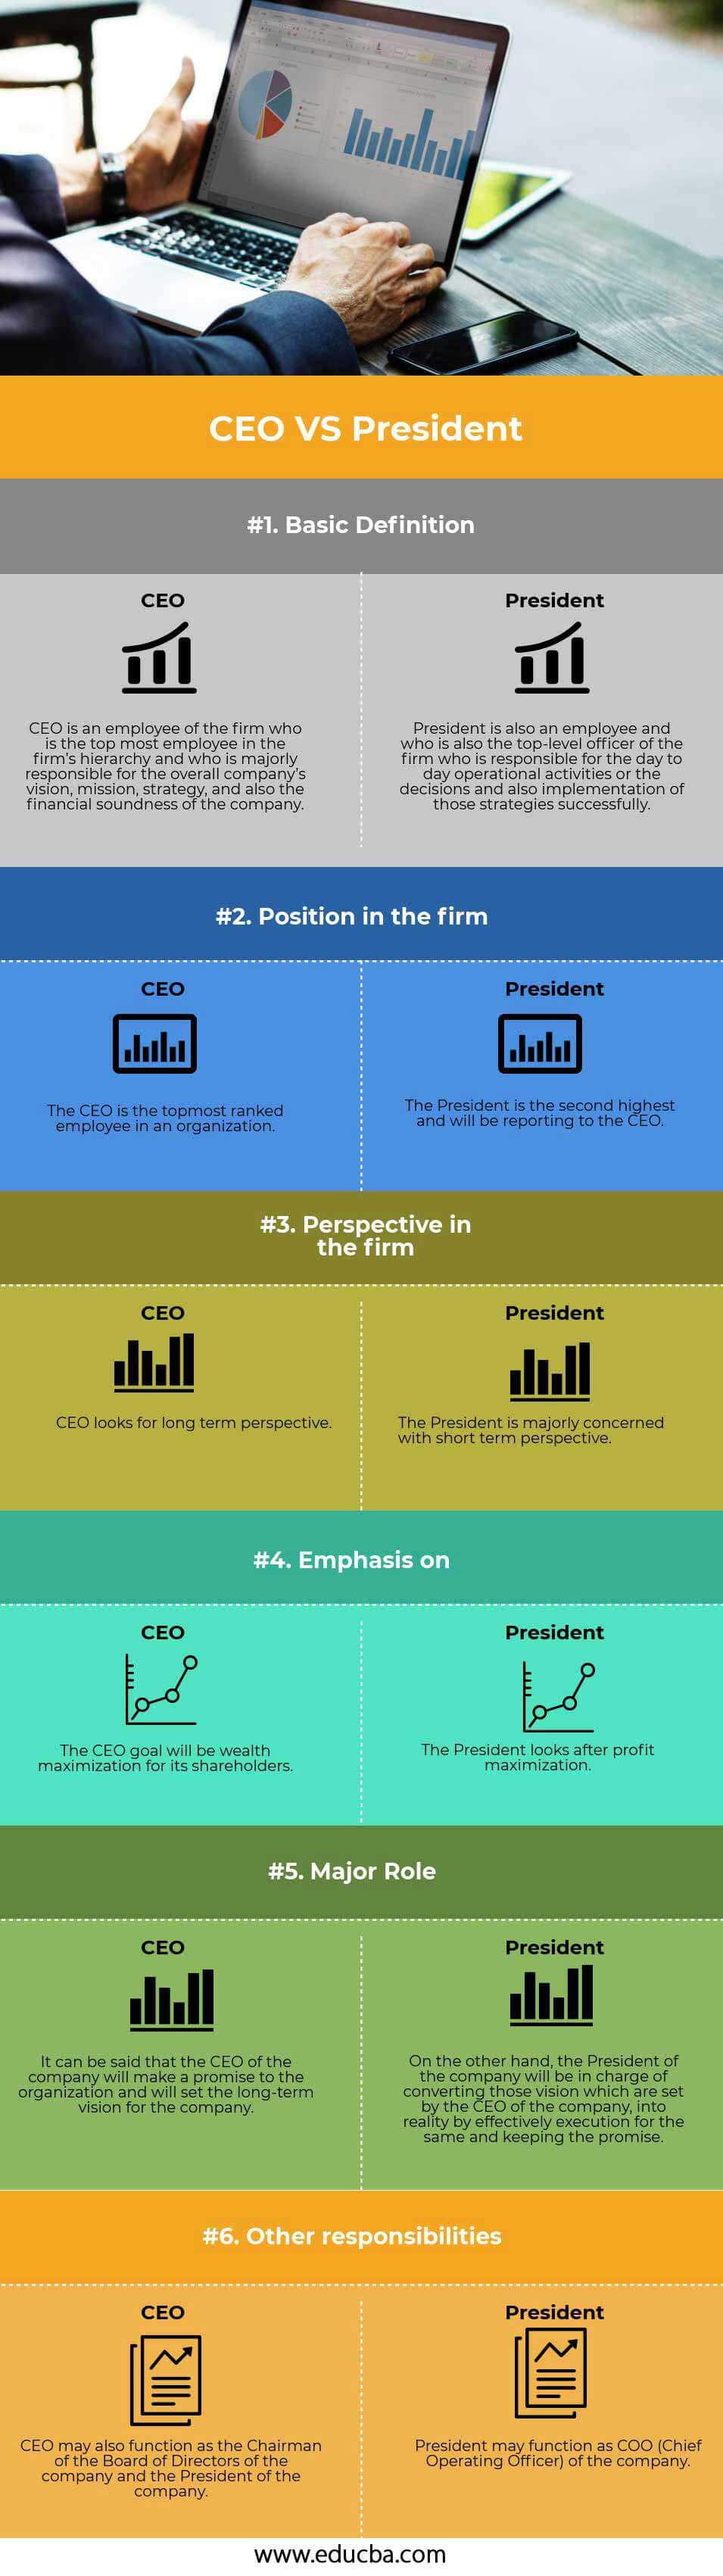 CEO-VSPresident-info